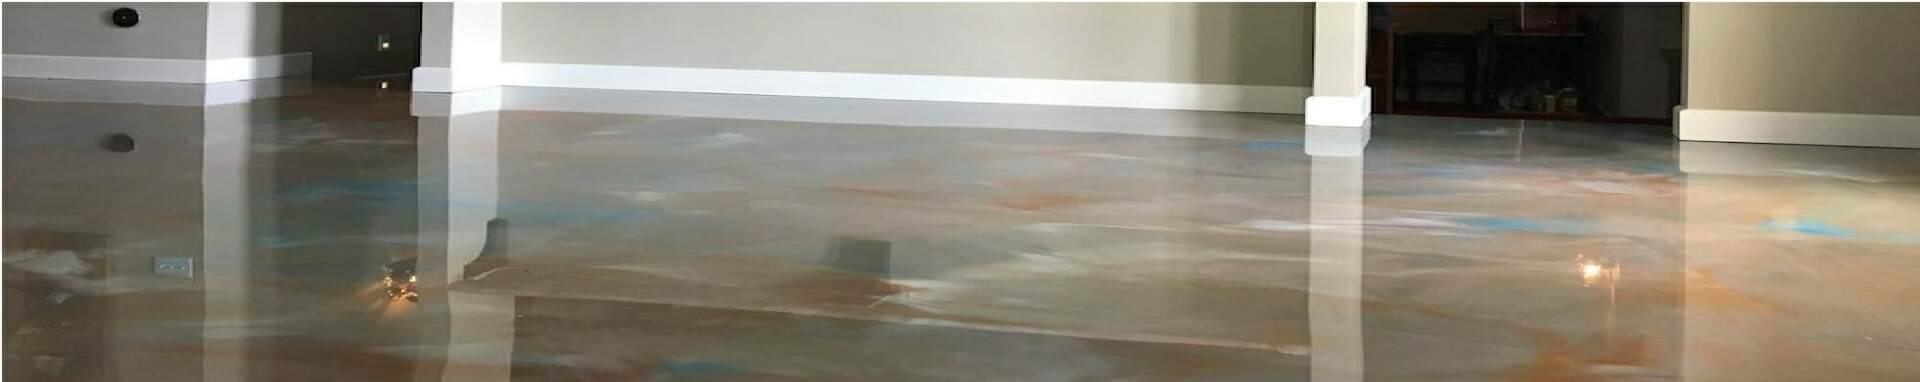 Epoxy Basement Flooring